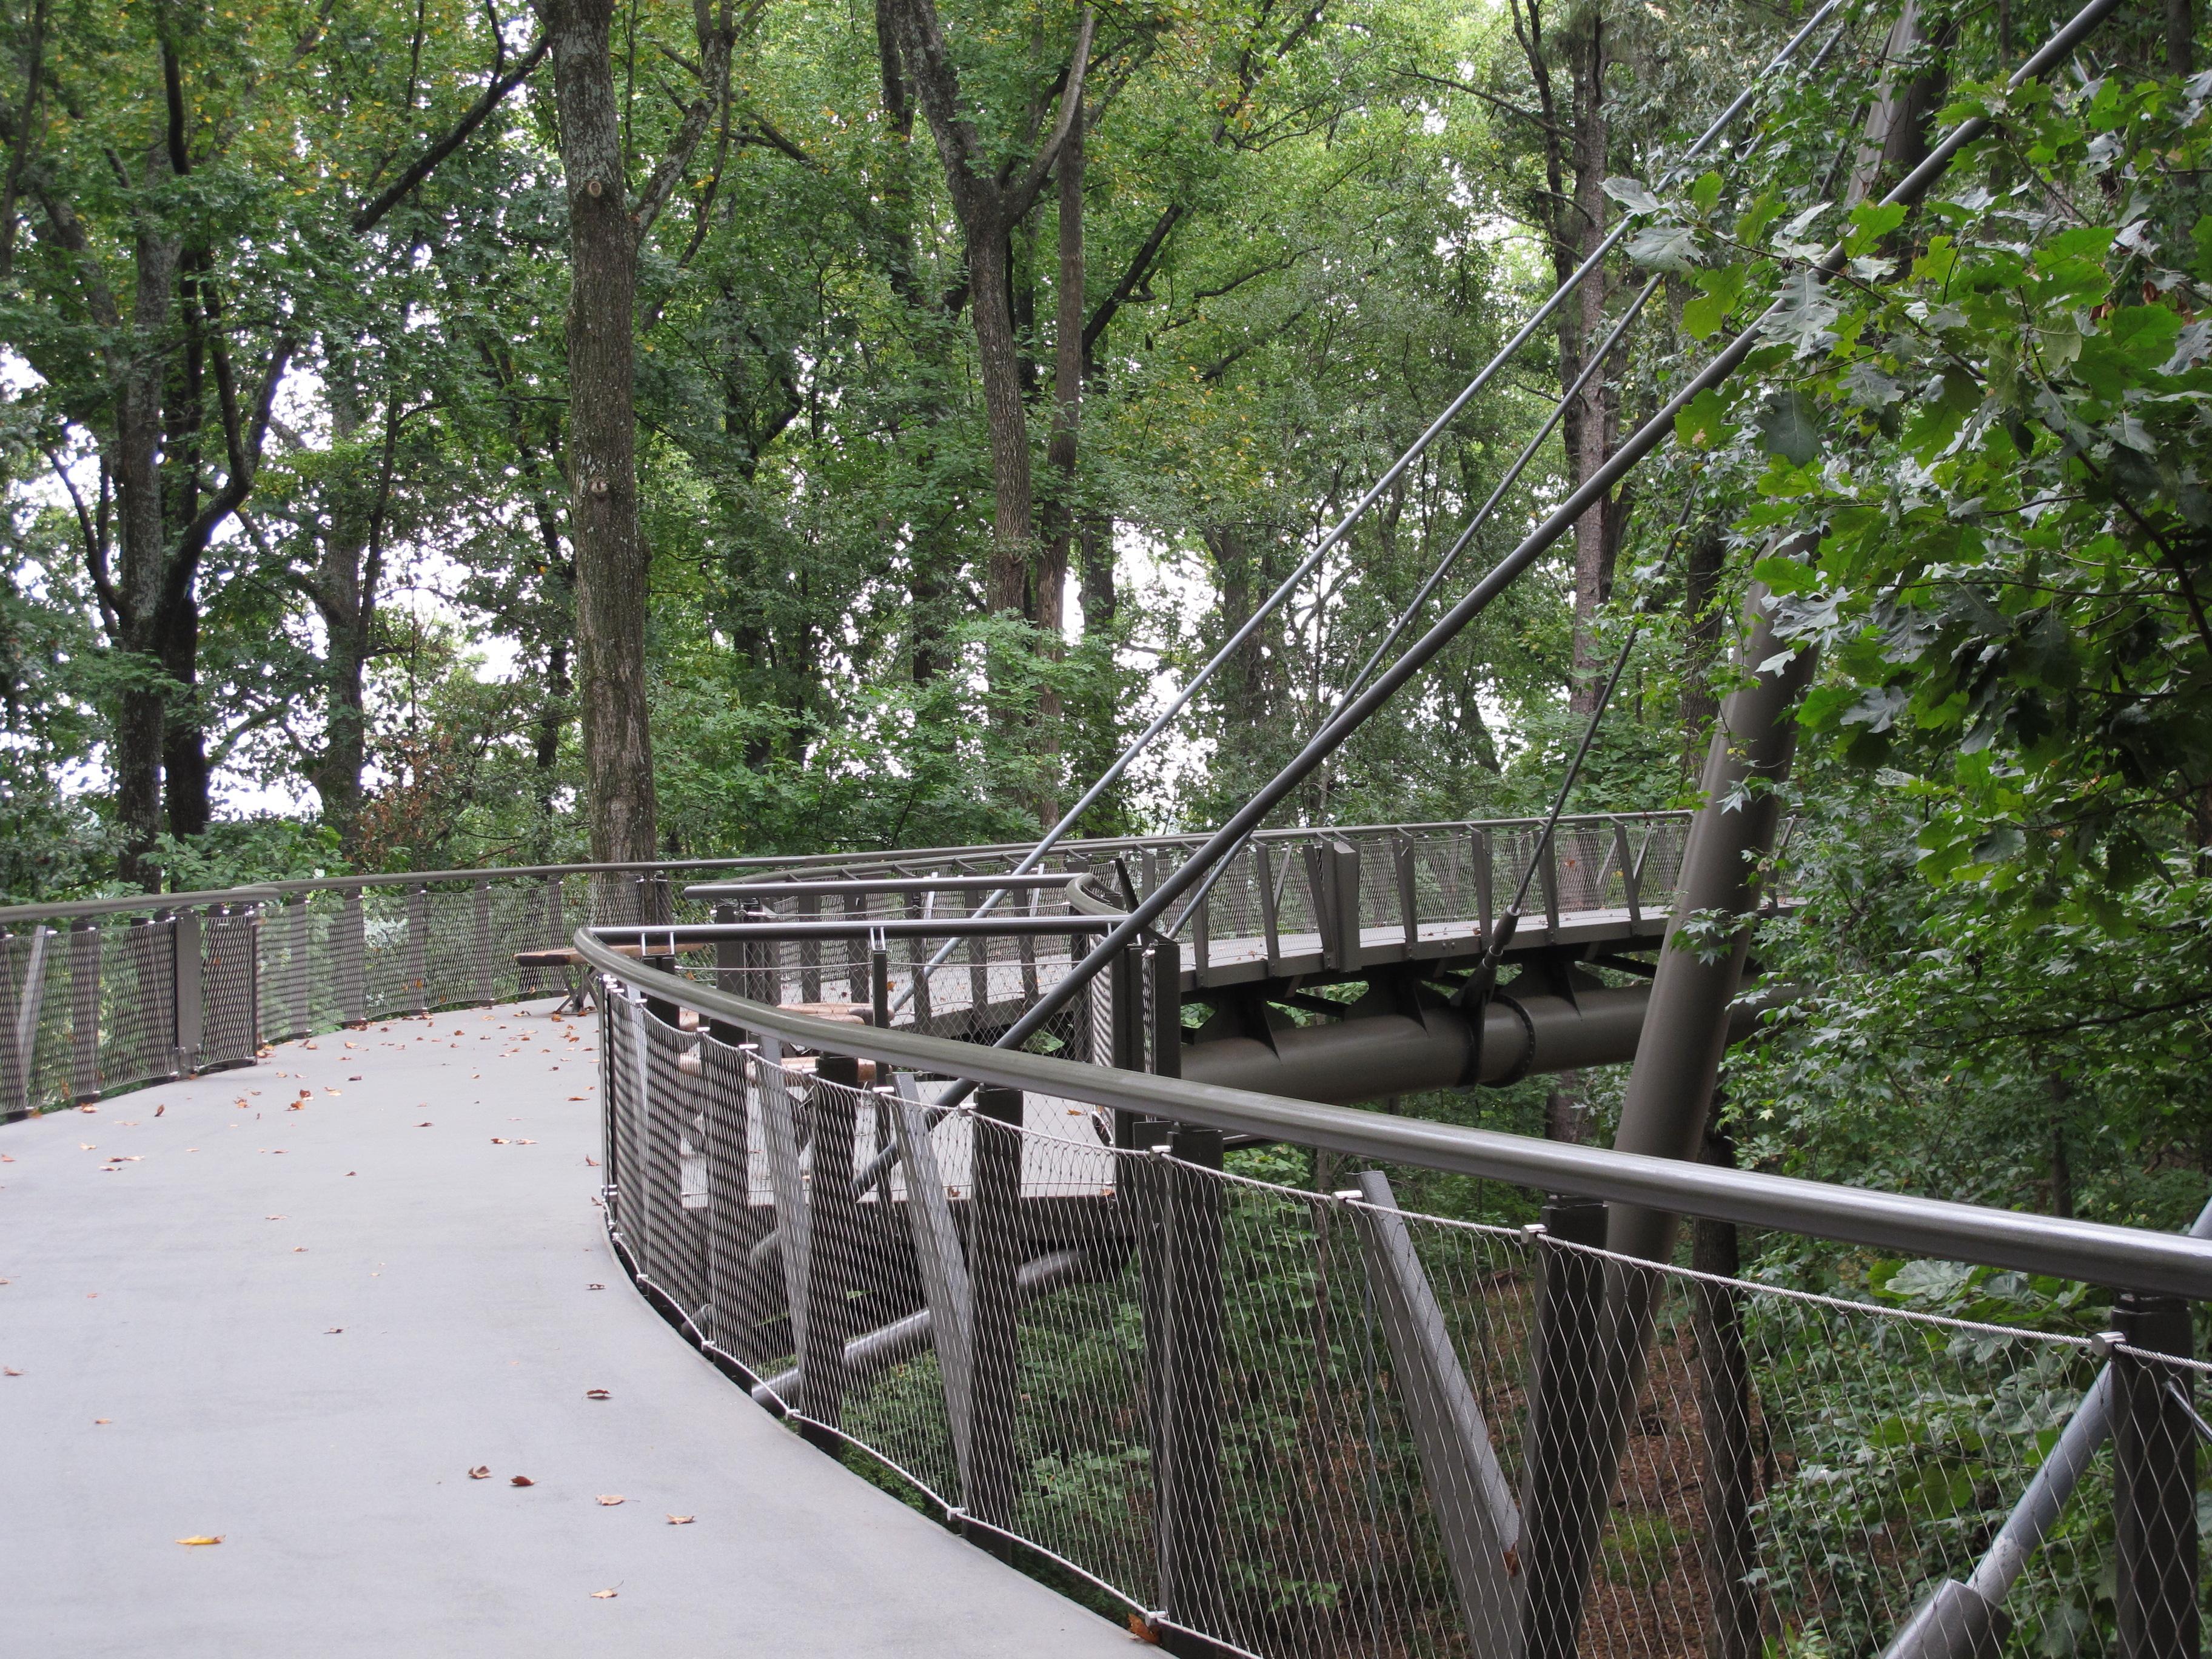 FileCanopy walk Atlanta.jpg & File:Canopy walk Atlanta.jpg - Wikimedia Commons